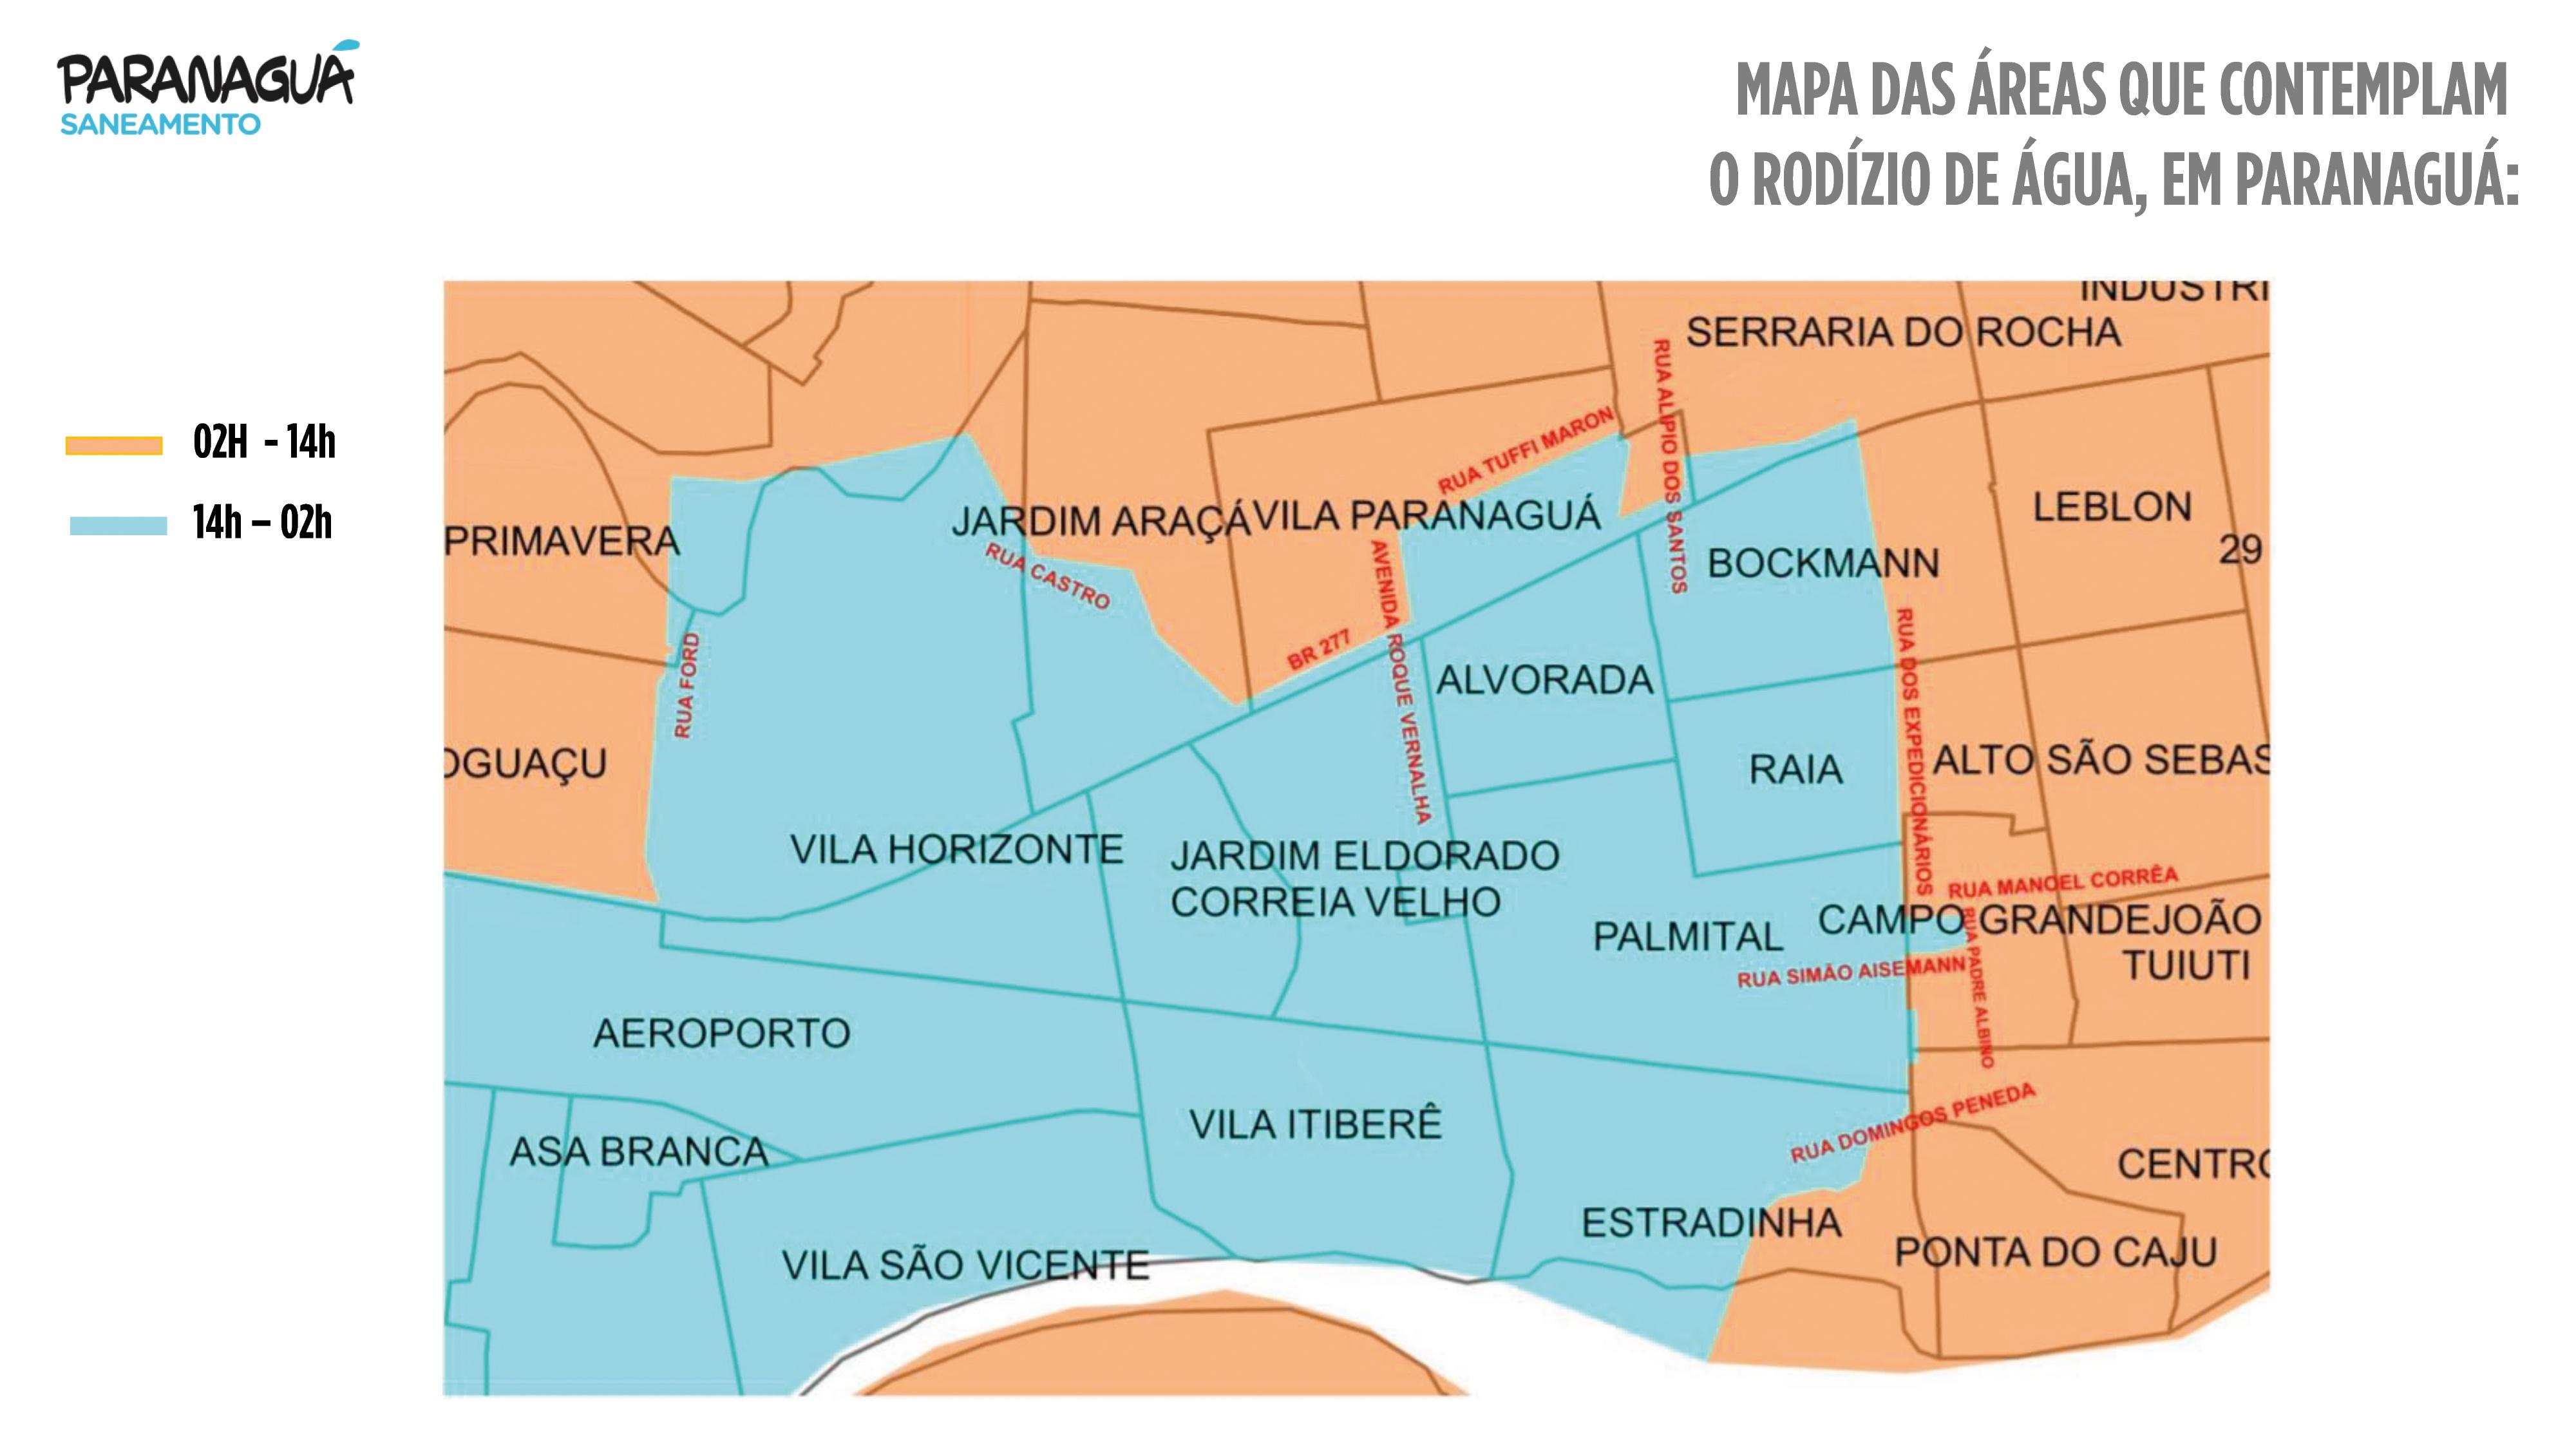 Mapa das áreas do rodízio de água